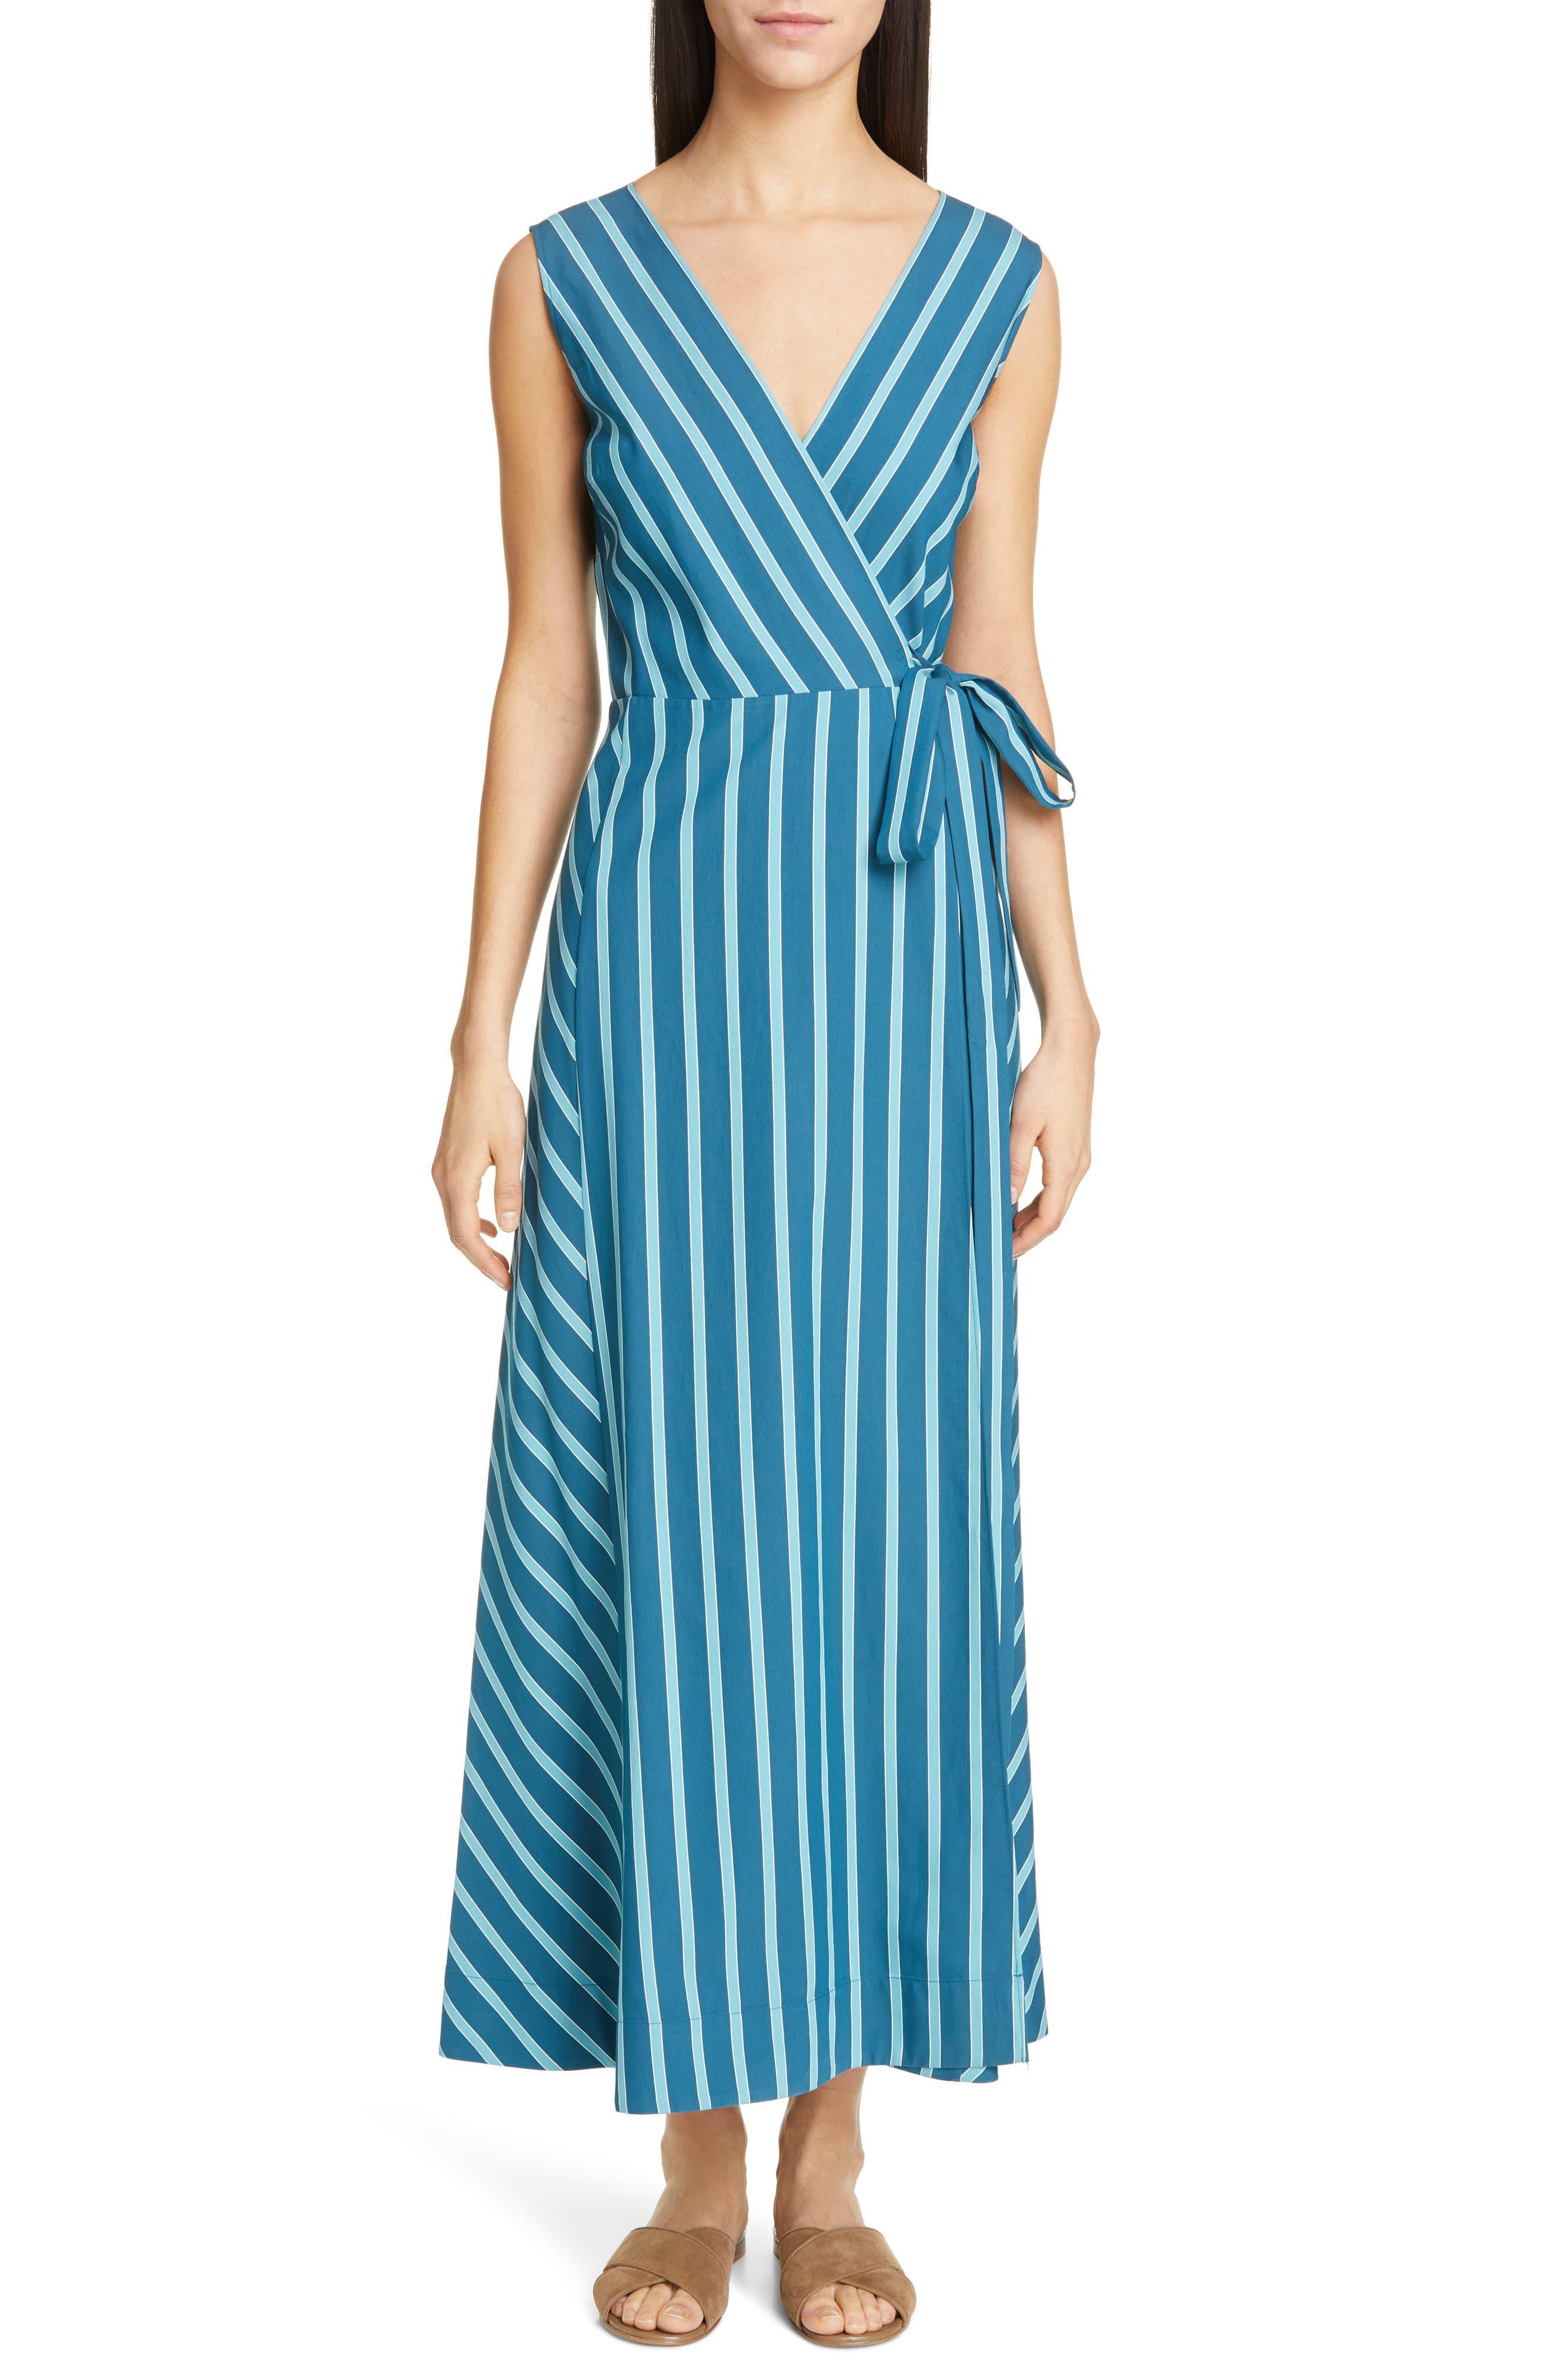 LAFAYETTE 148 NEW YORK Siri Wrap Dress, Main, color, PACIFIC MULTI